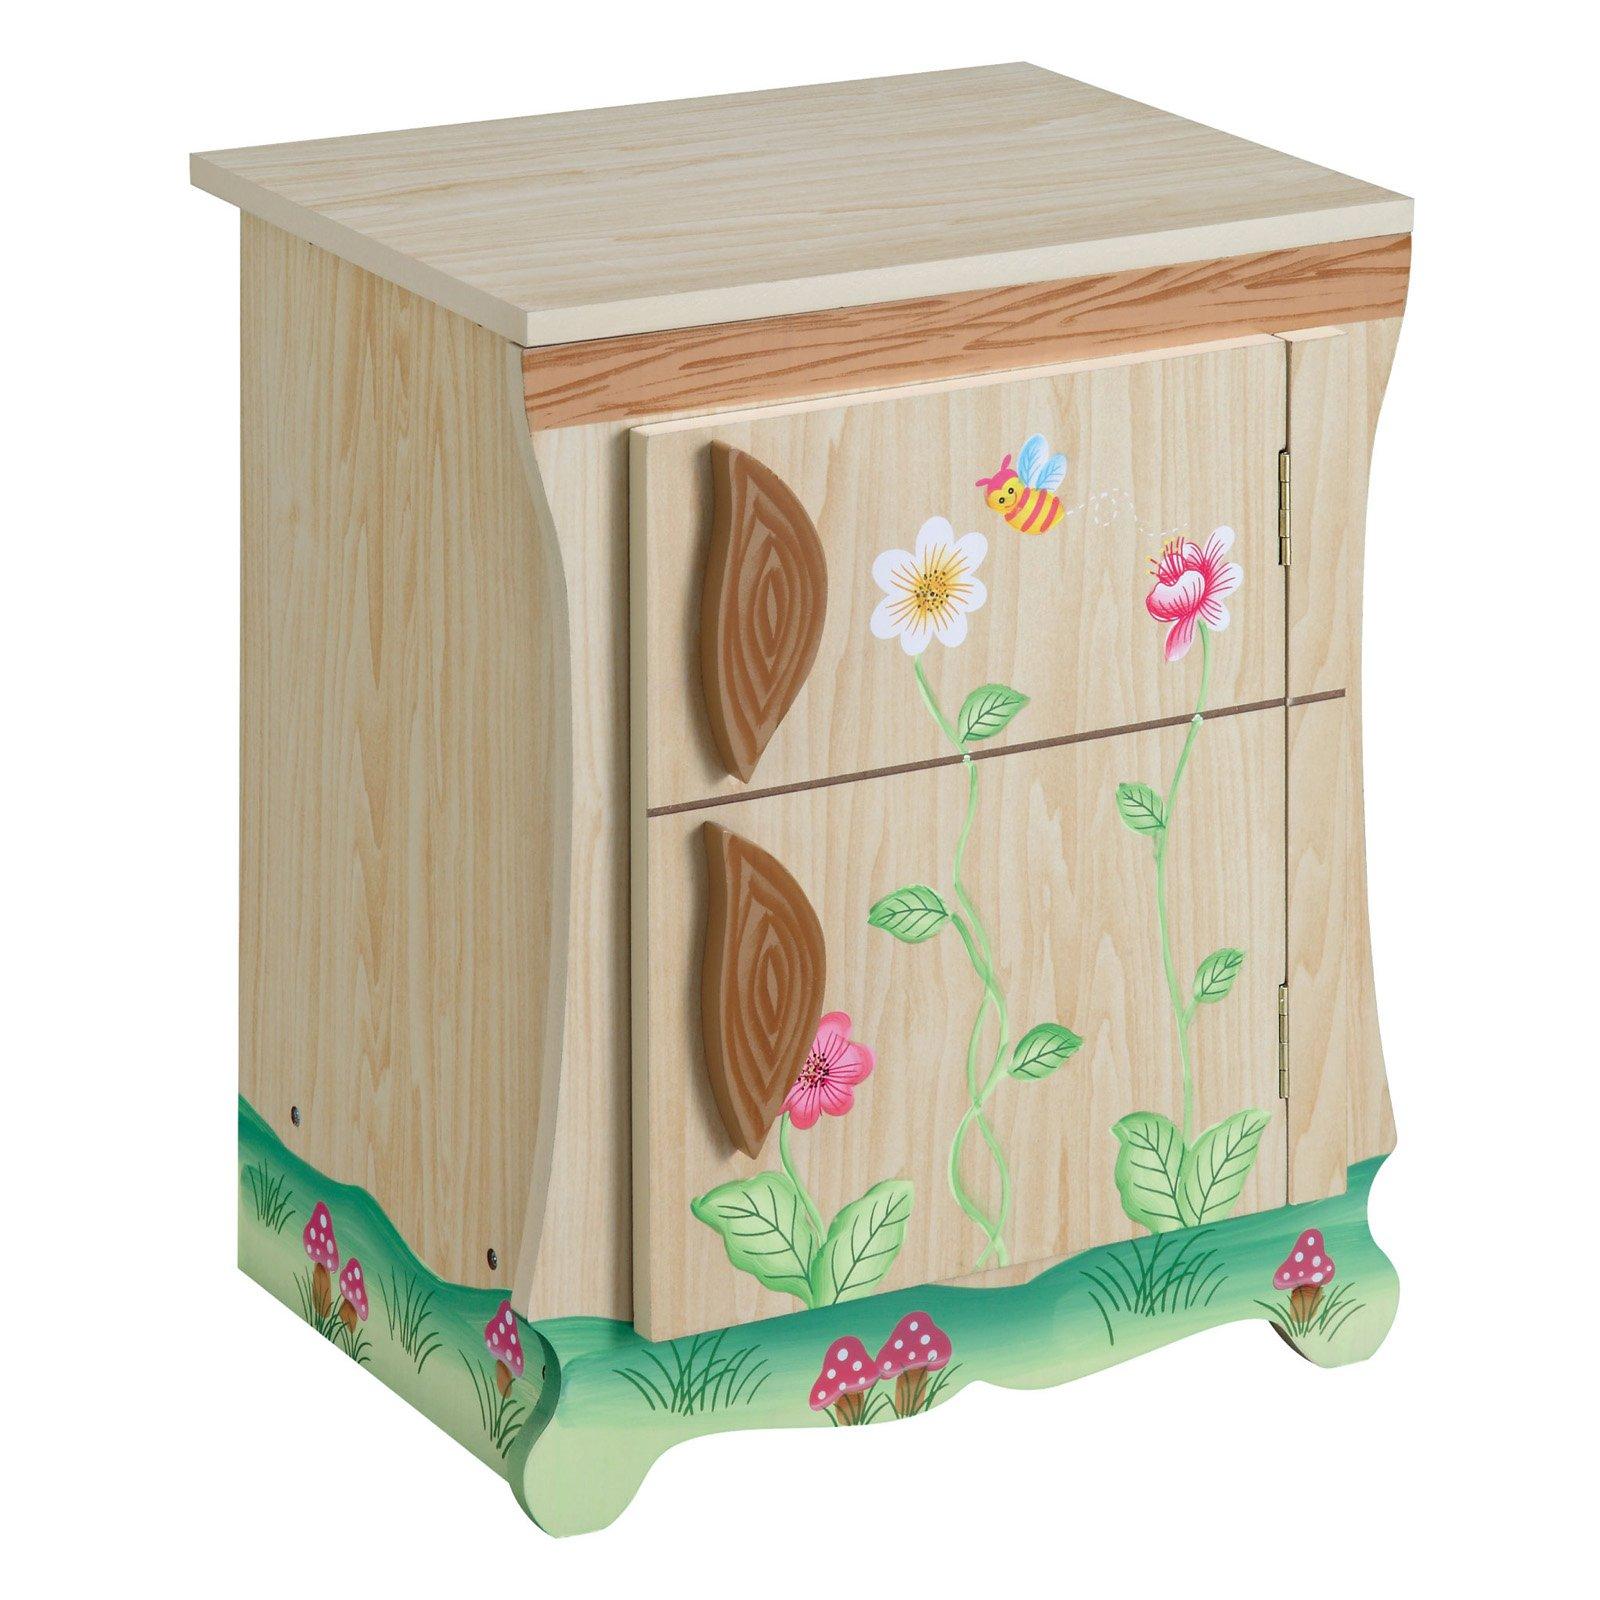 Teamson Kids - Little Chef Bremen Forest Play Kitchen - Fridge - Burly wood $27.99 - (Target $26.59 w/RC) & More - Walmart *Online